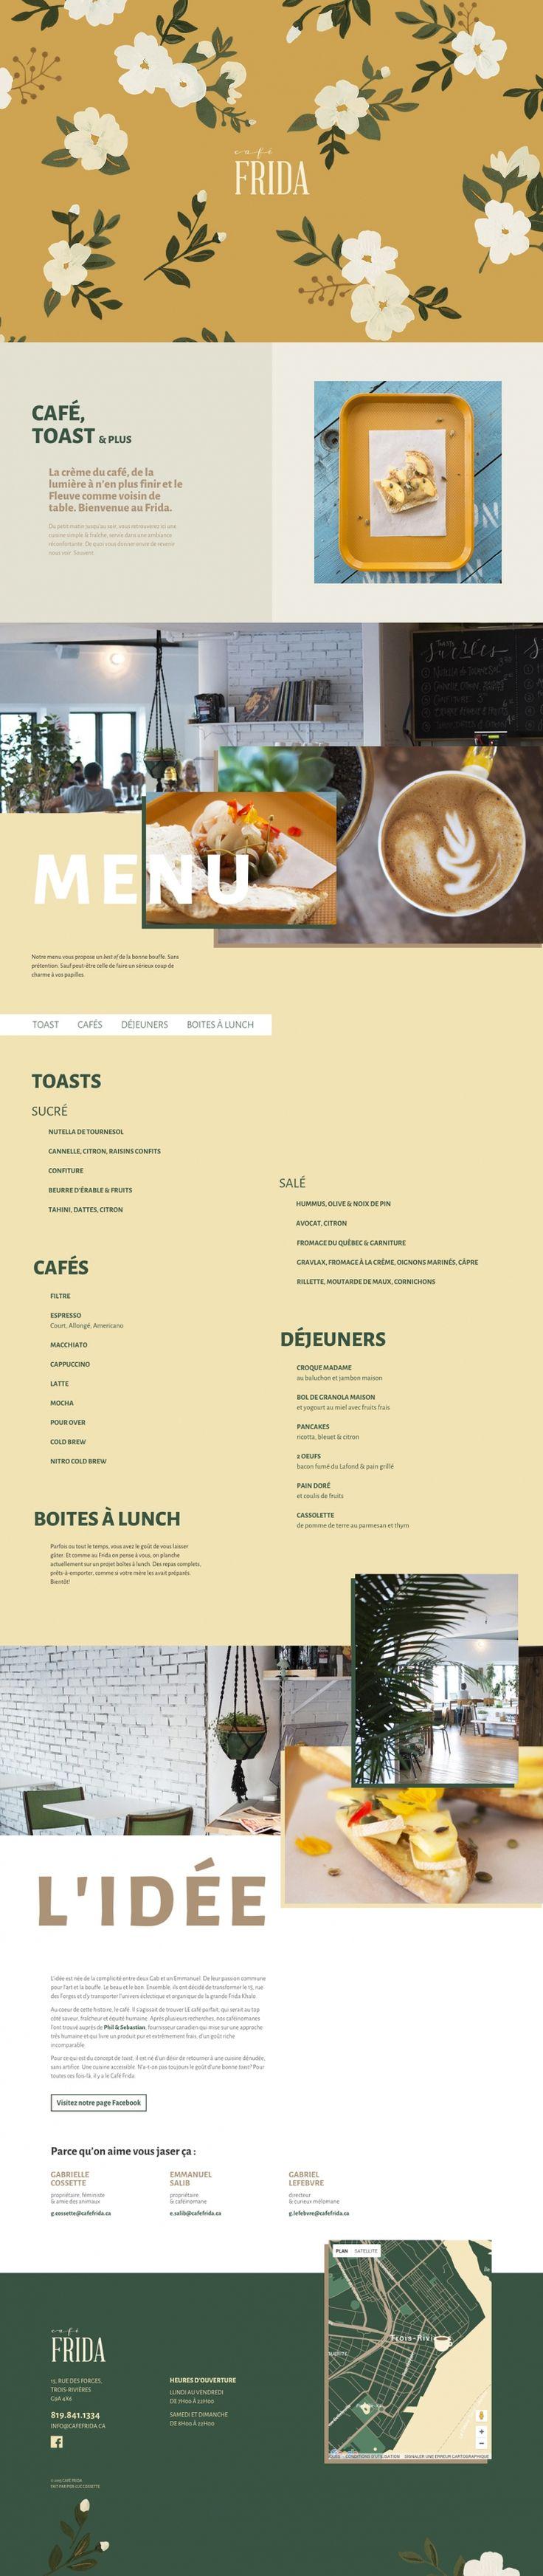 CAFÉ FRIDA UI/UX Design by Marie-Michelle Dupuis and Pier-Luc Cossette | Fivestar Branding Agency – Design and Branding Agency & Curated Inspiration Gallery #website #web #webdesign #ui #uidesign #uxdesign #behance #dribbble #pinterest #fivestarbranding